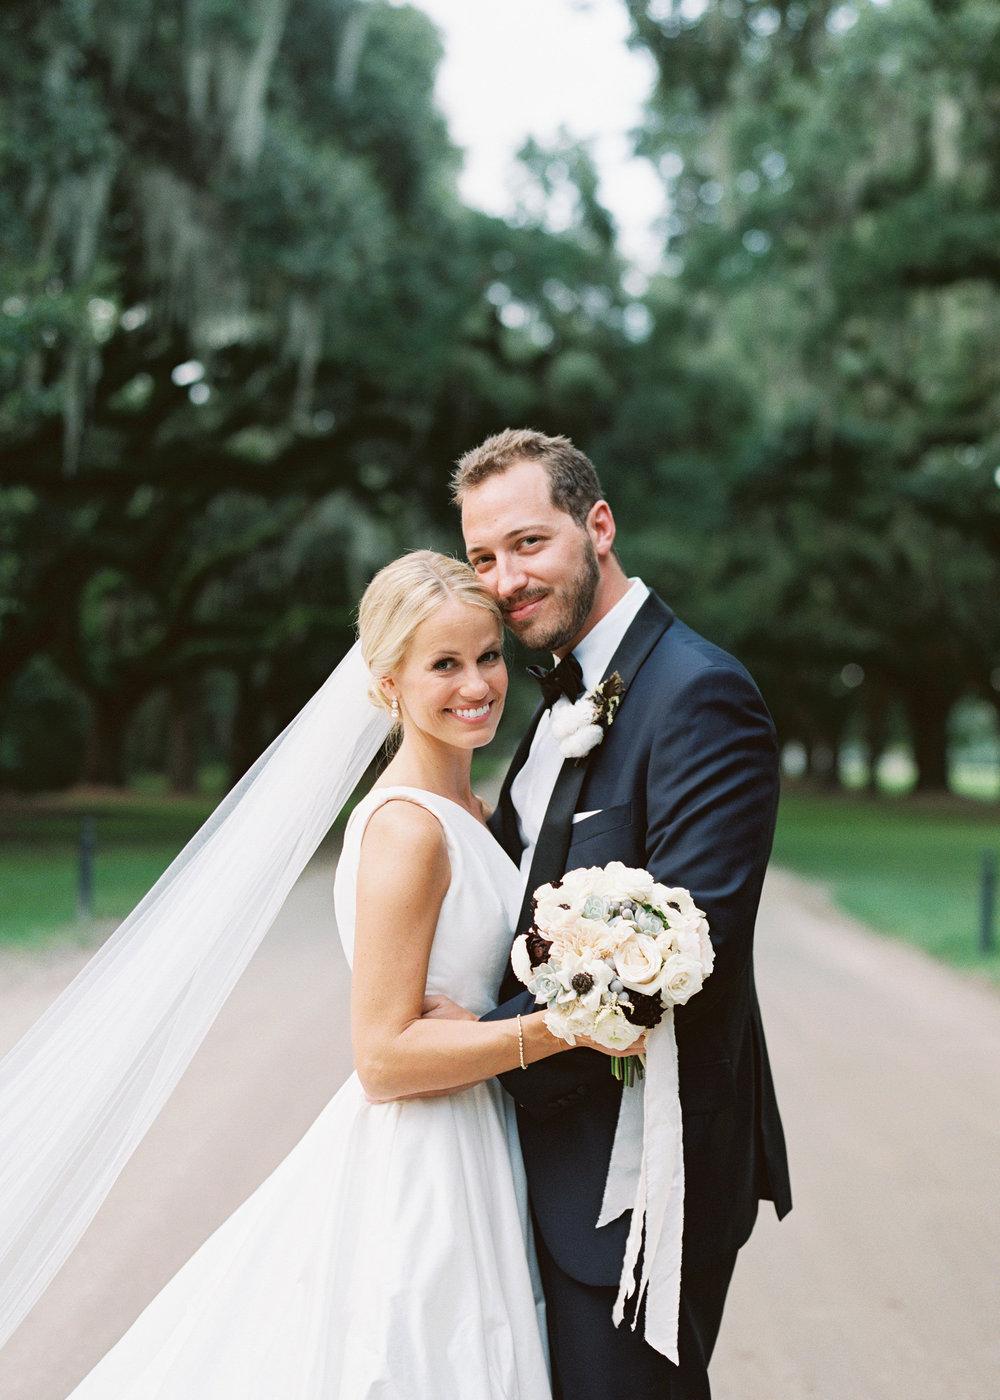 Ashley & Adam's wedding at Boone Hall Plantation  //  Wedding photography by Landon Jacob  //  A Lowcountry Wedding Magazine